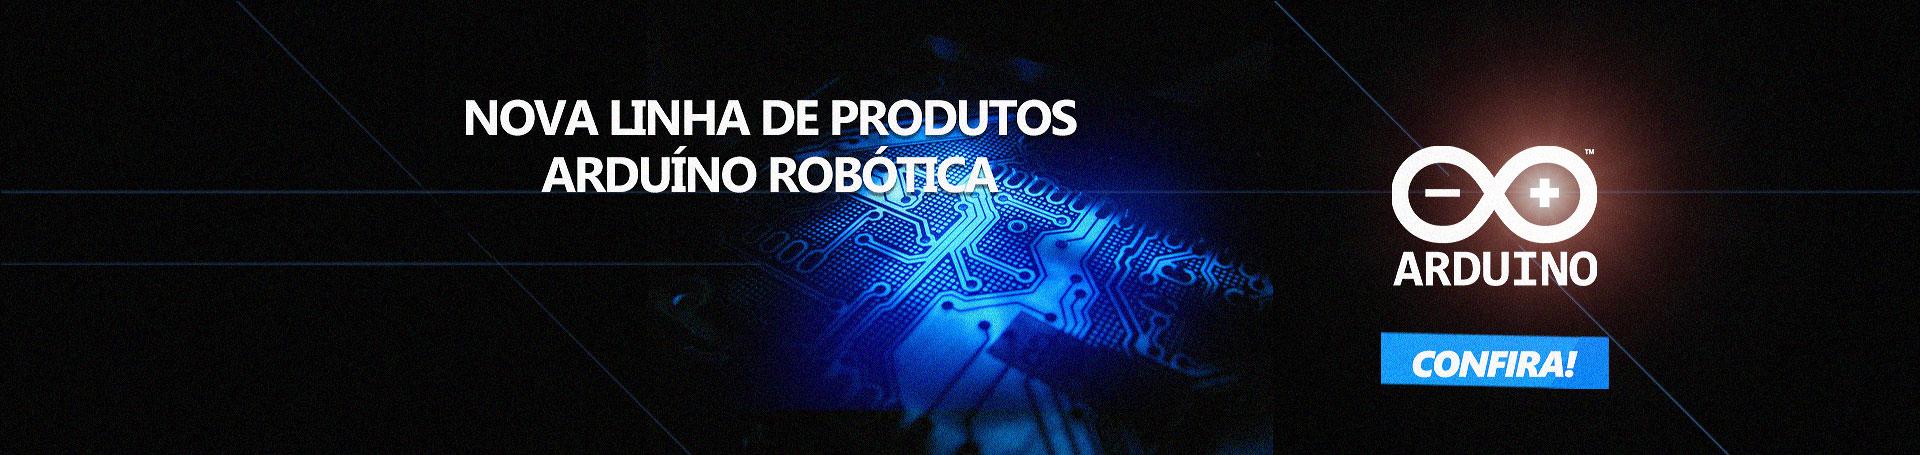 Robotica Arduino